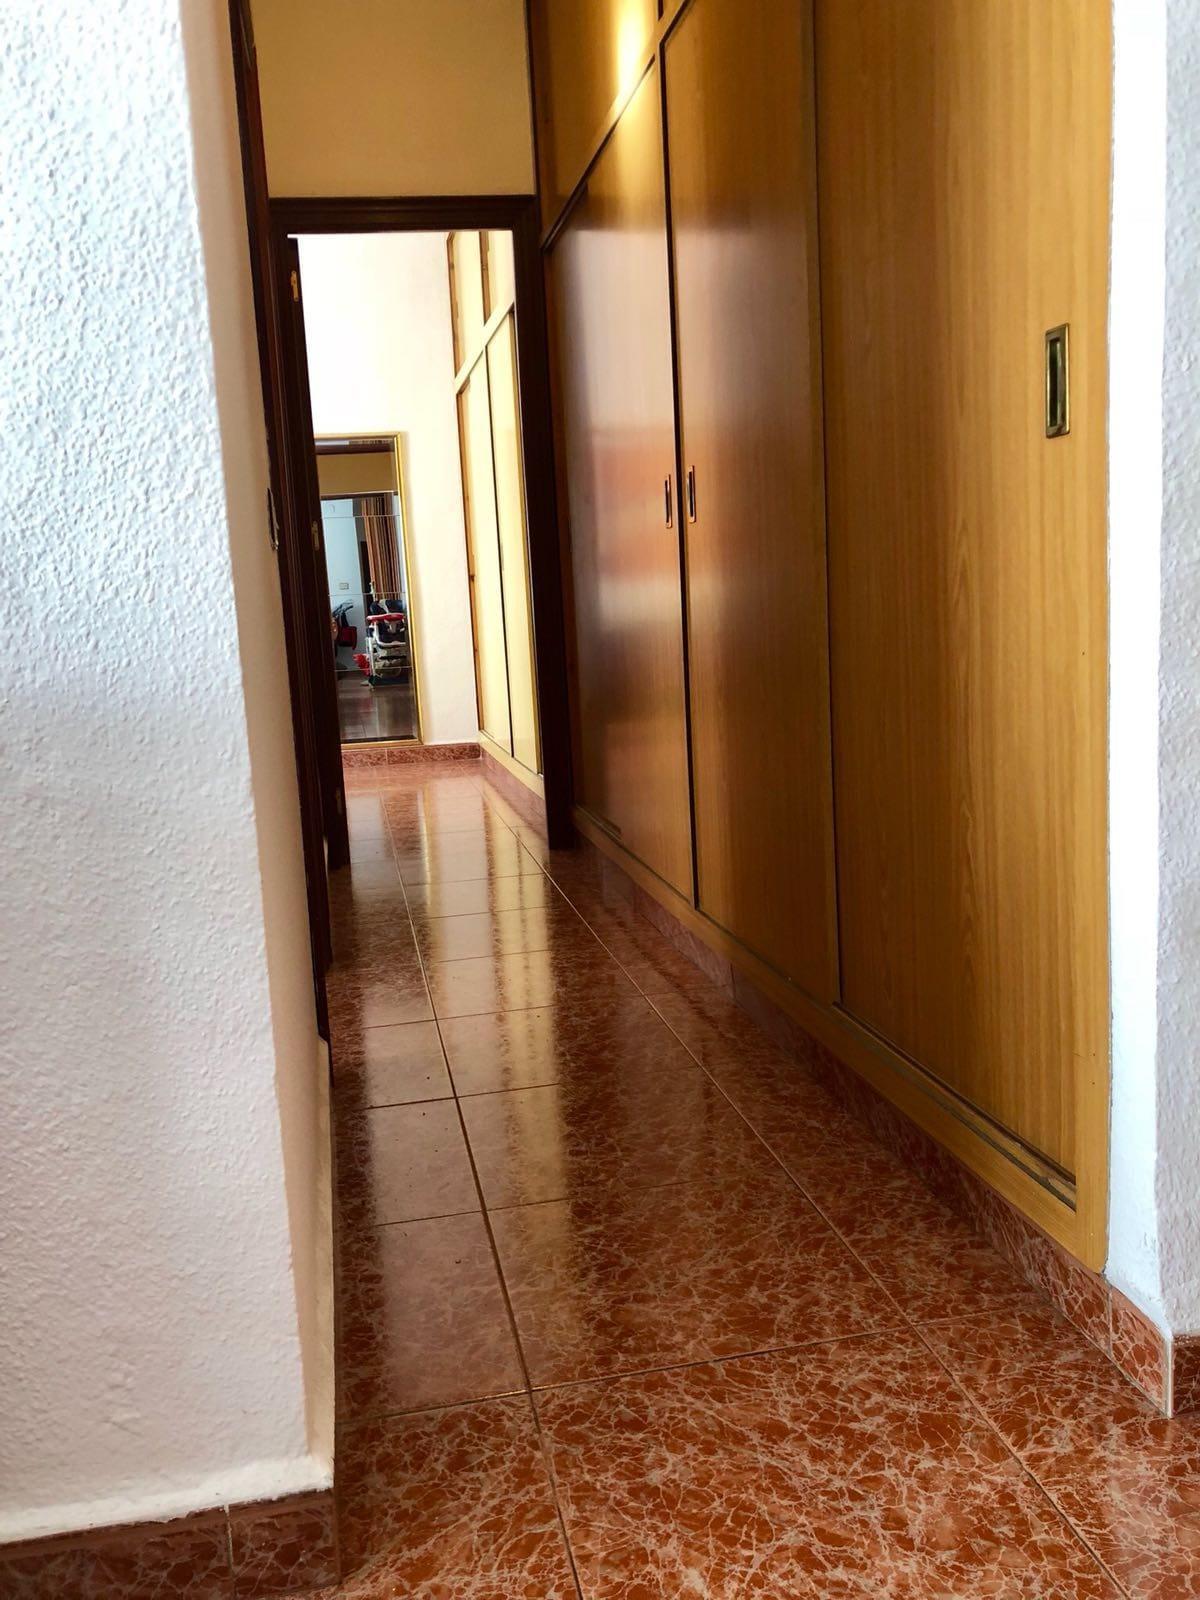 Byt v pronájmu v Centro-Sagrario (Granada), 650€/ měsíc